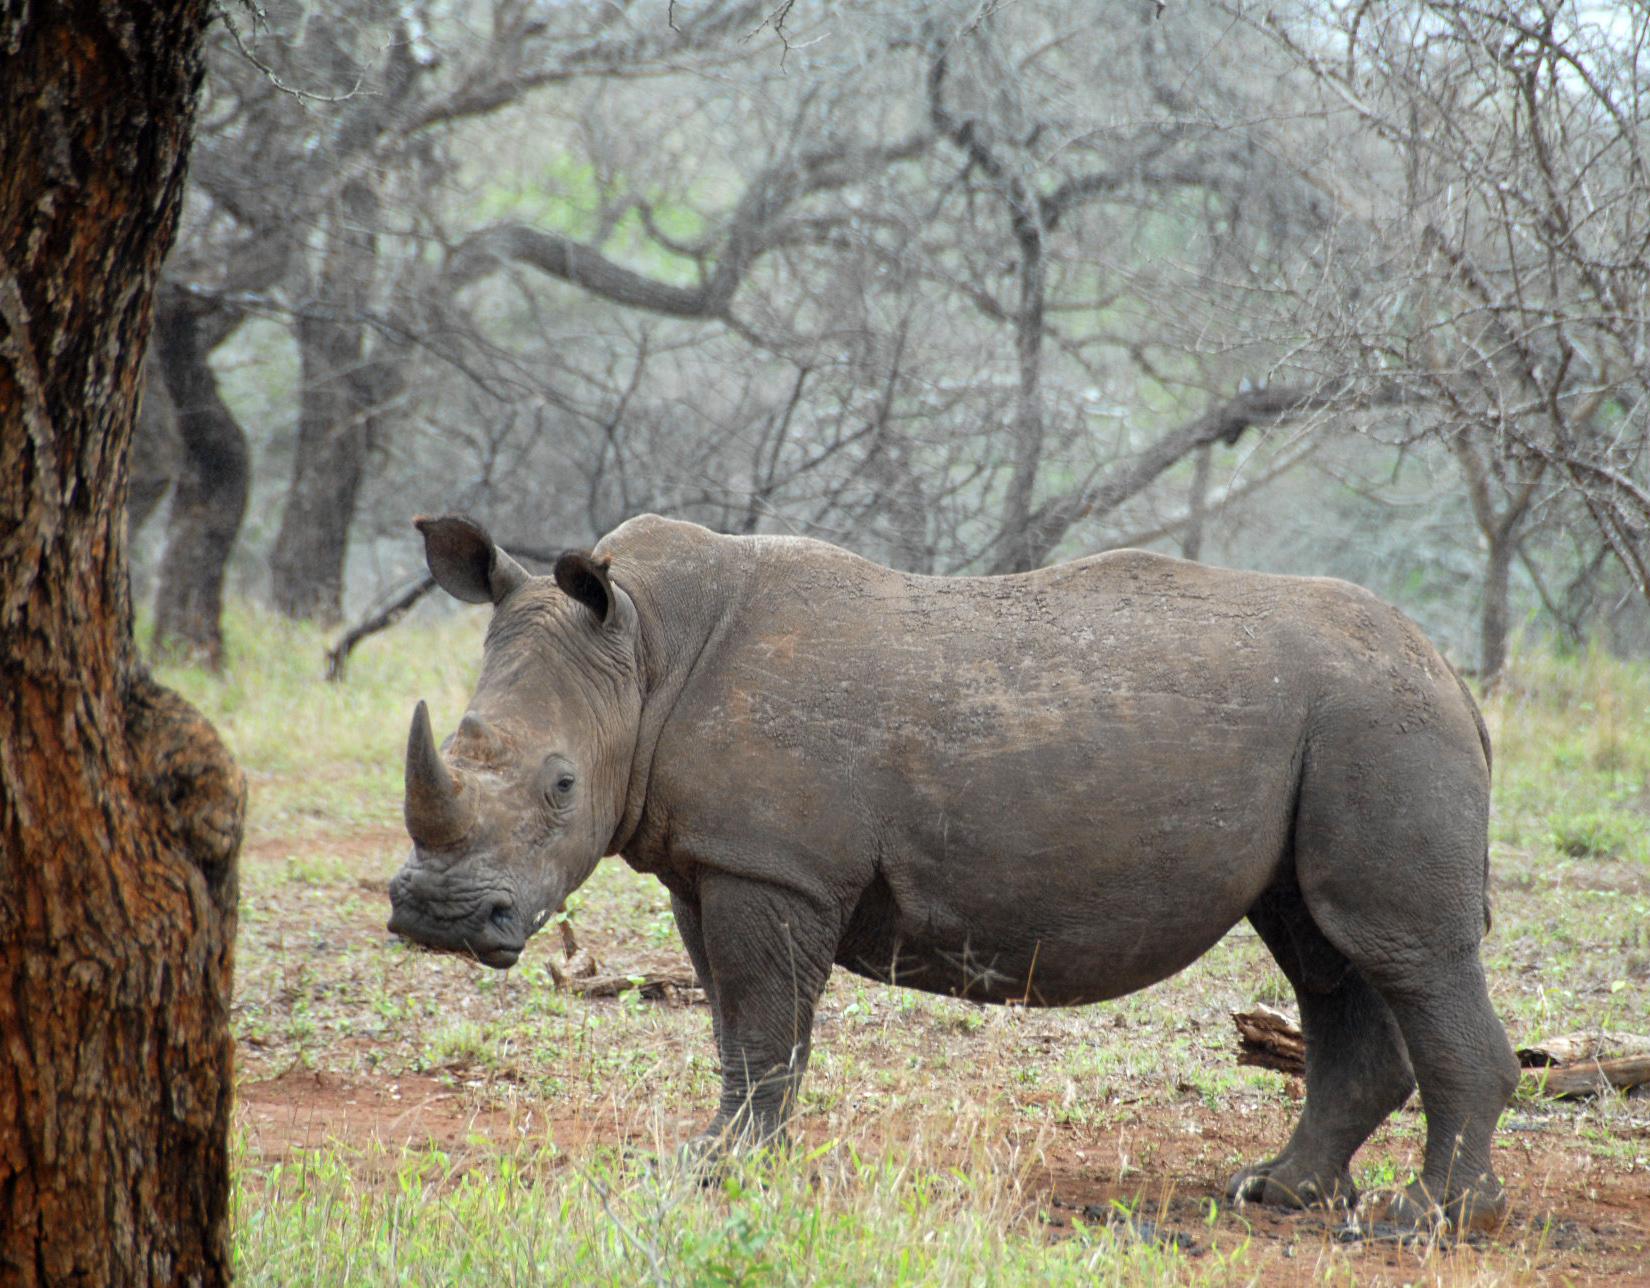 Rhinos on the heels of Tigers